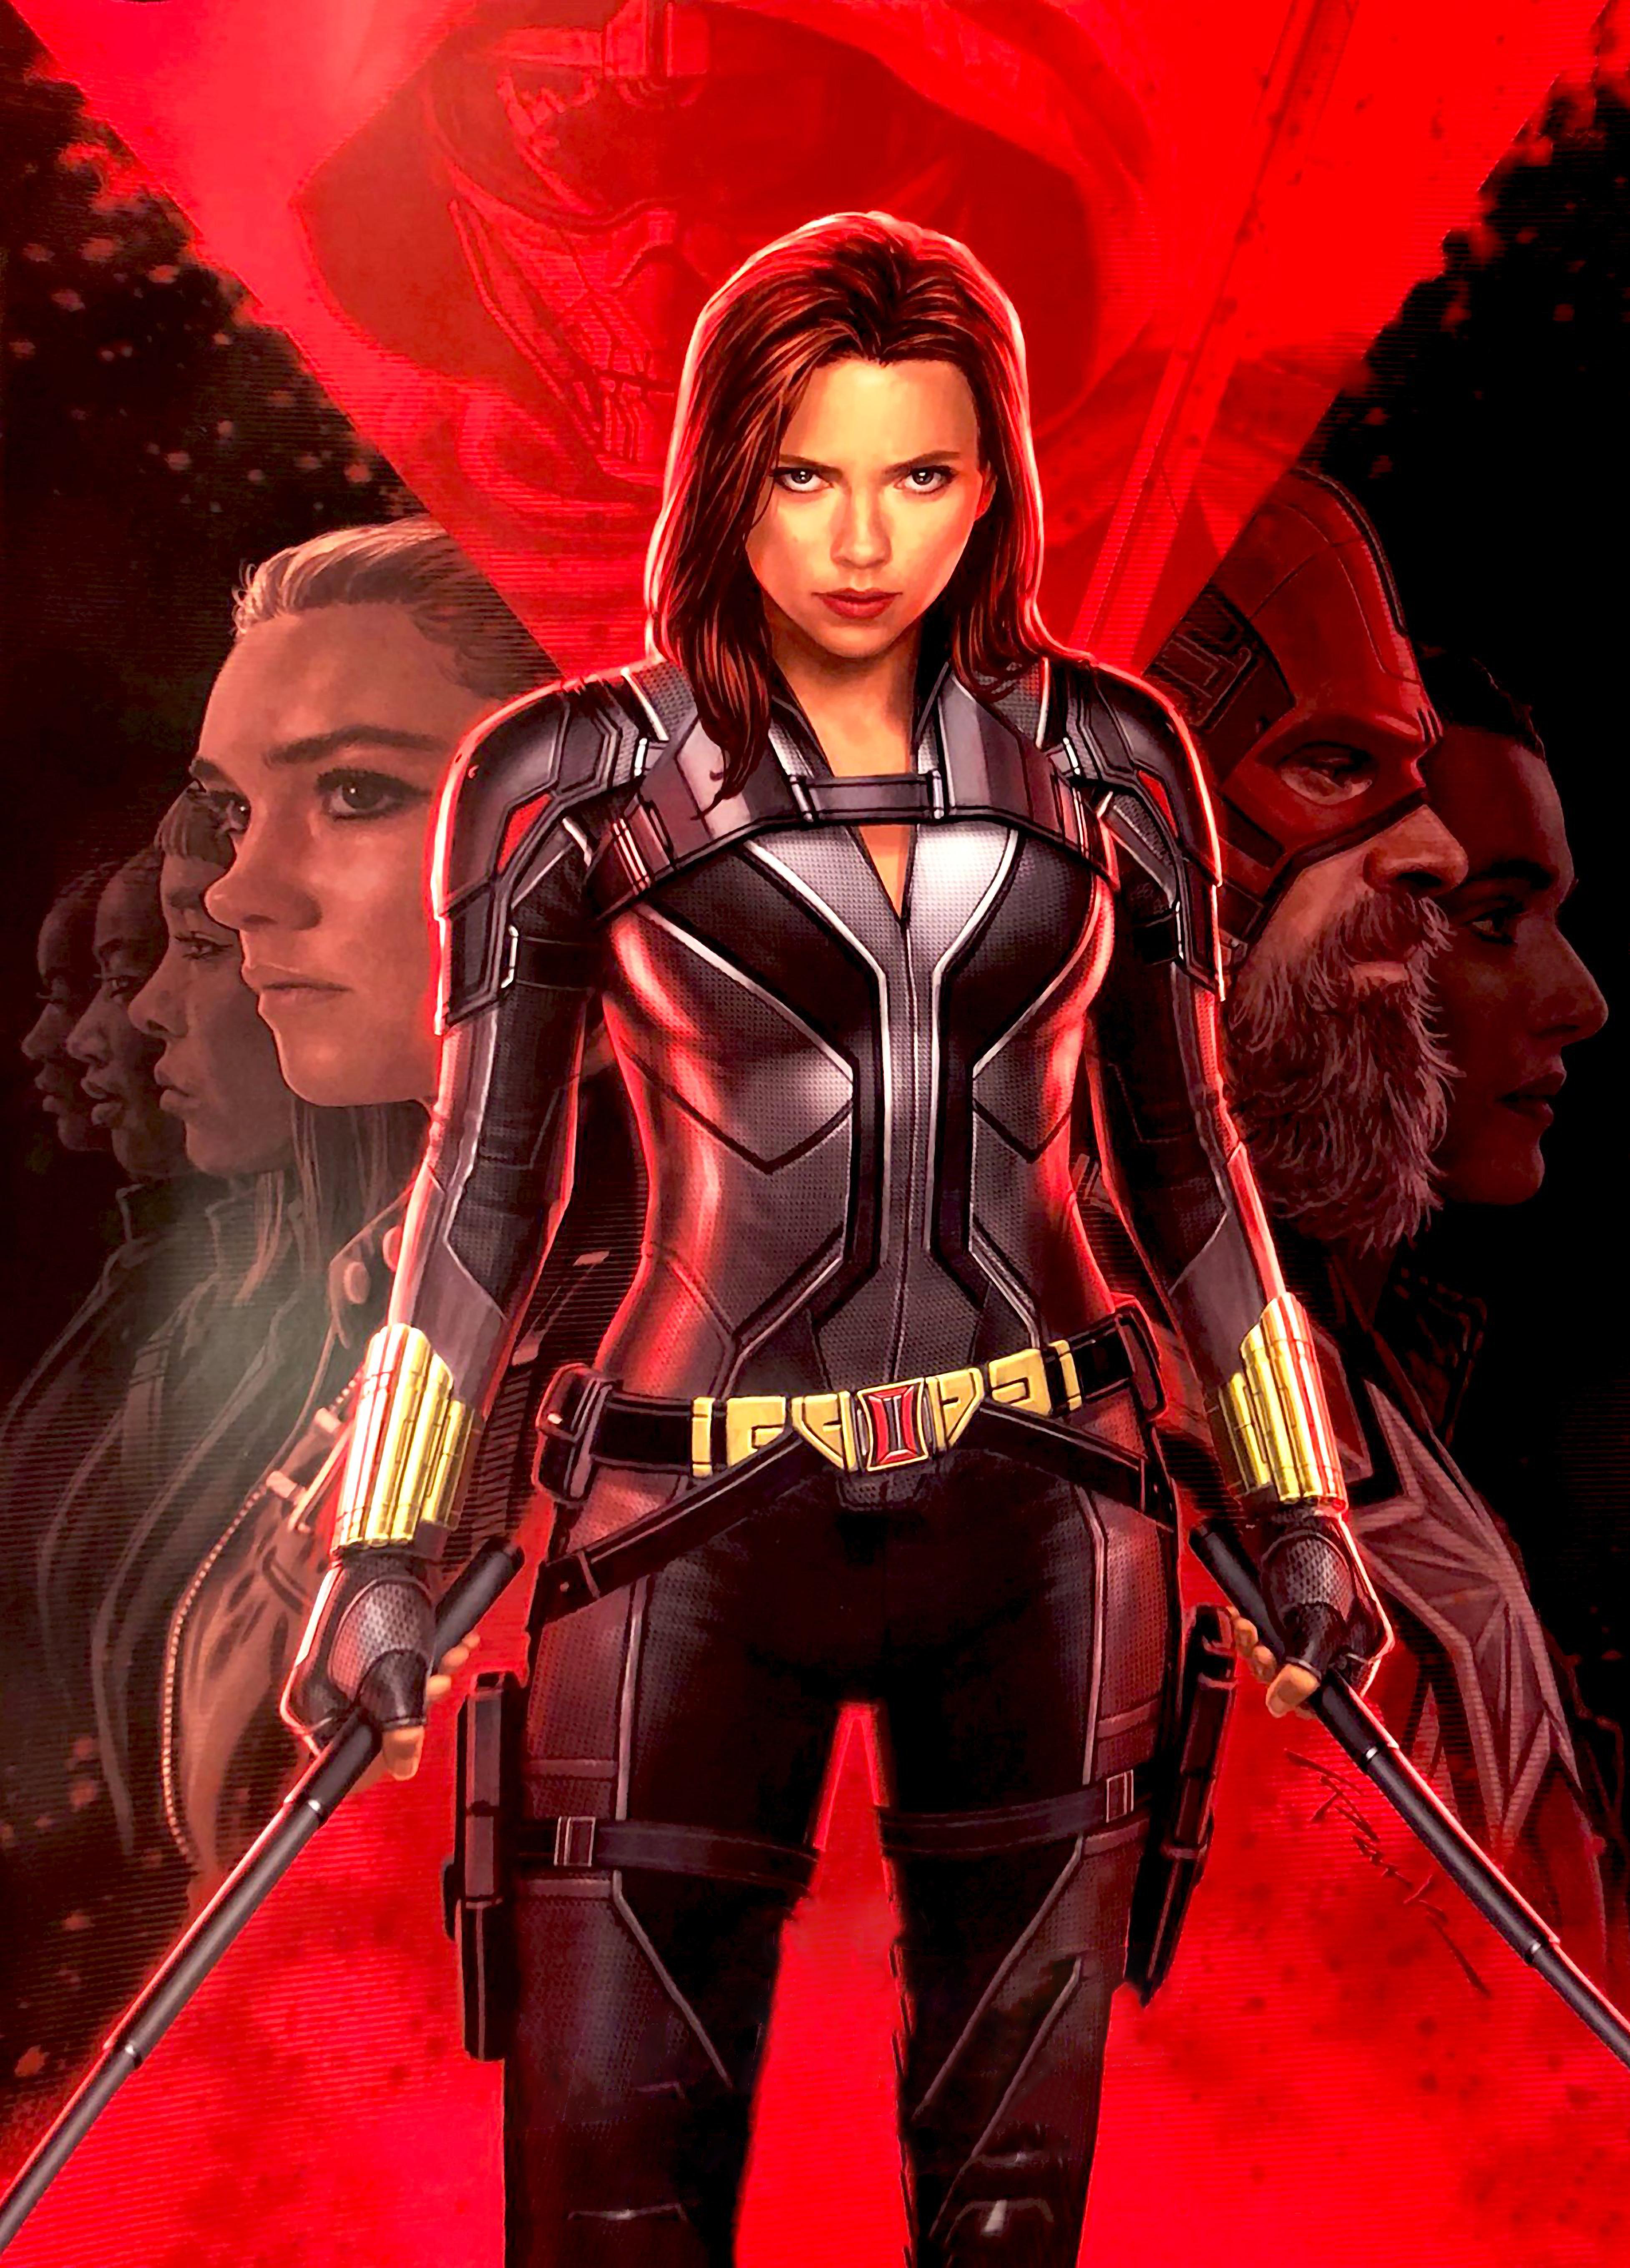 Black Widow Movie Poster Wallpaper, HD Movies 4K ...